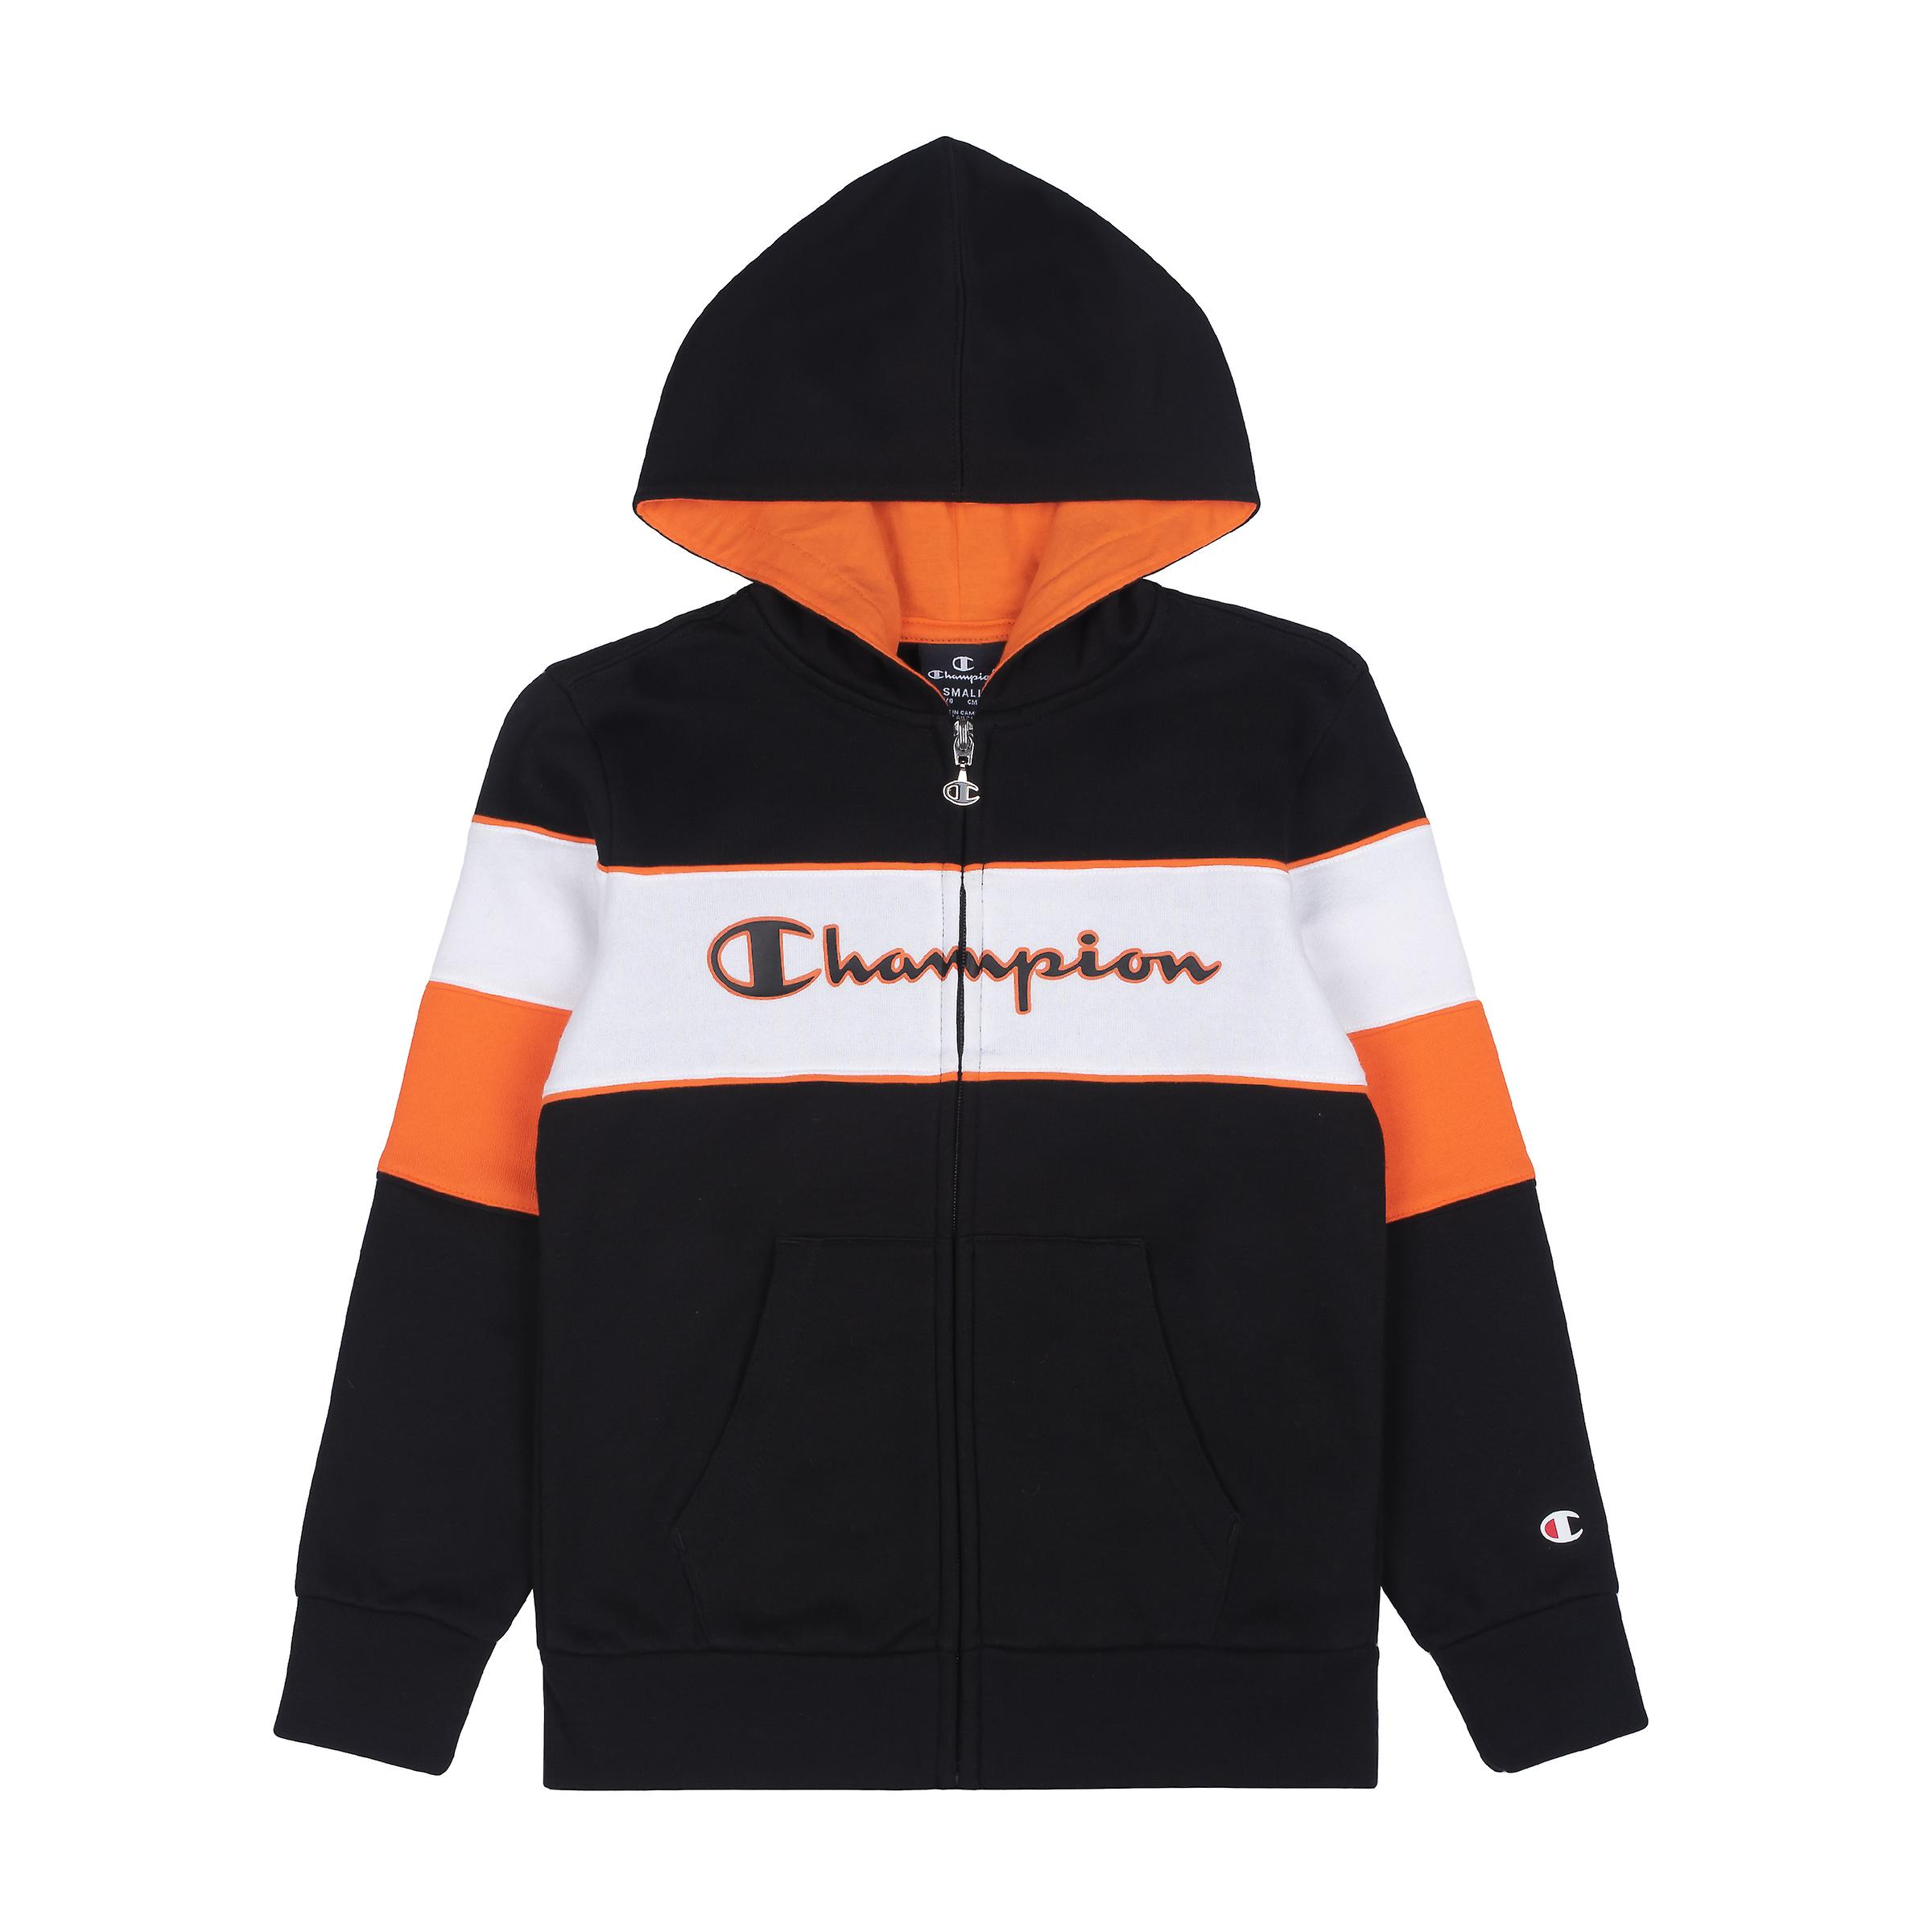 Champion Kids Zip Sudadera con capucha con capucha Full Zip 305388